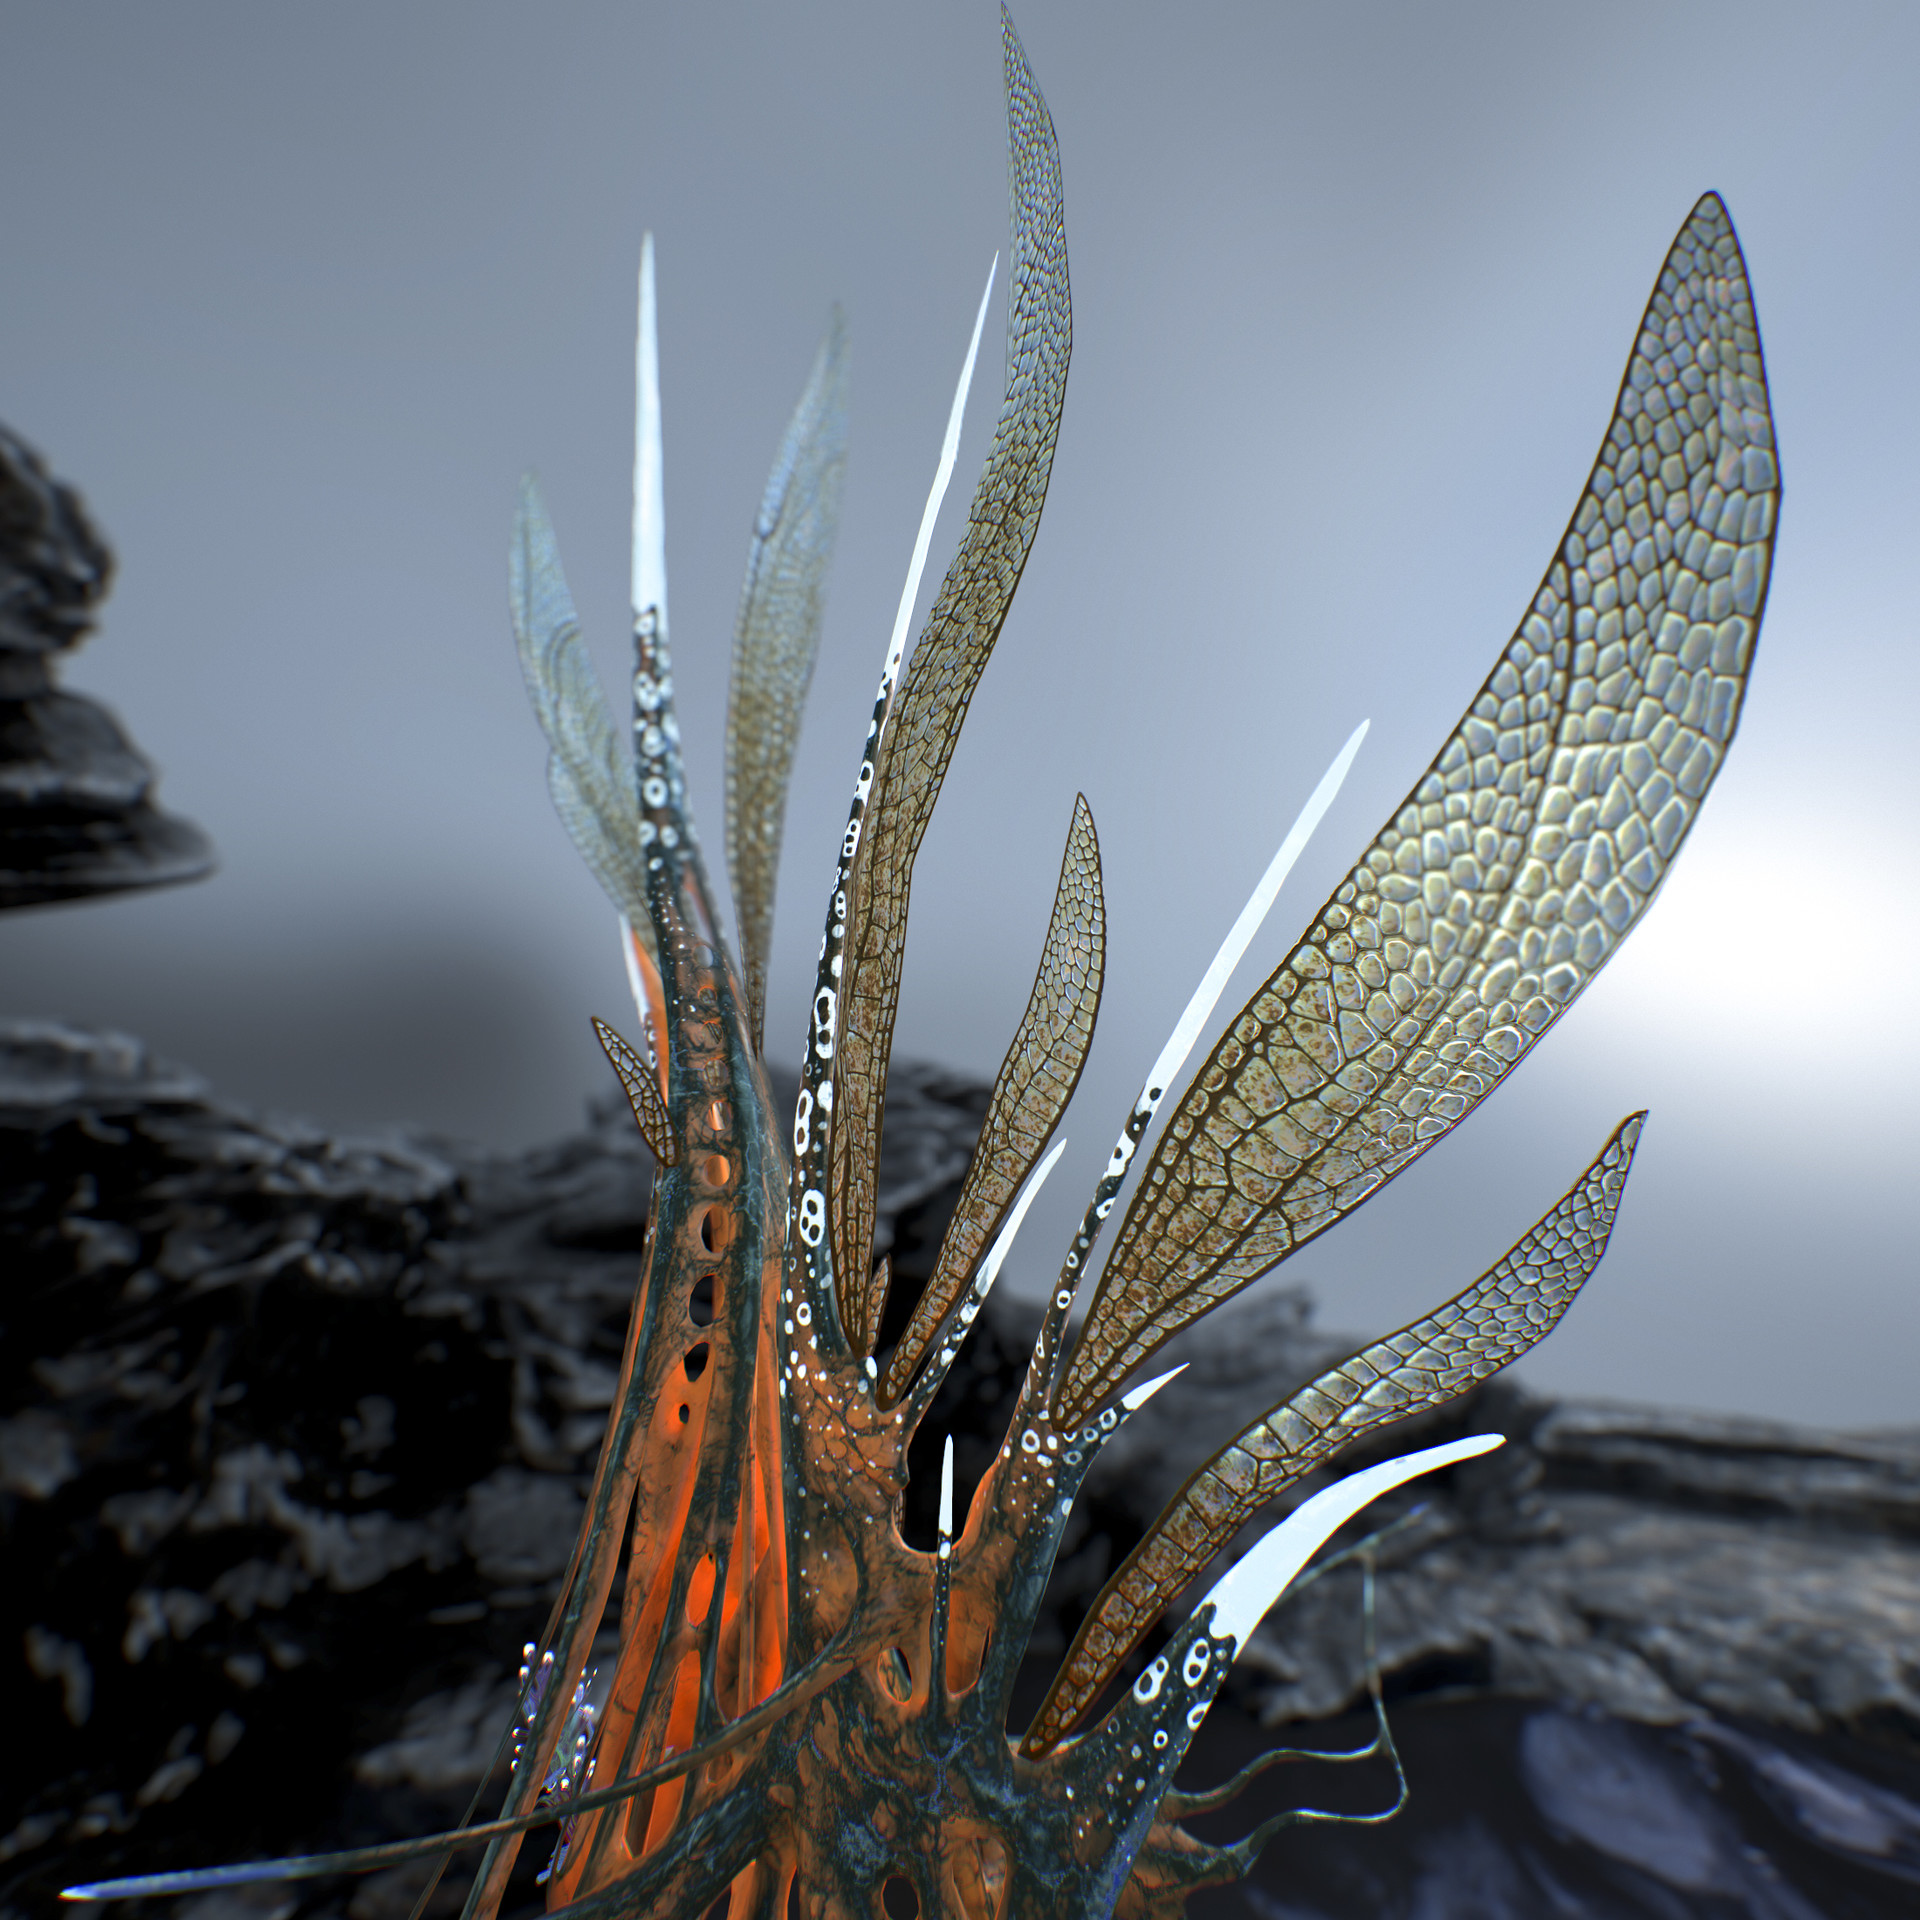 Johan de leenheer alien fern misota spletinus42